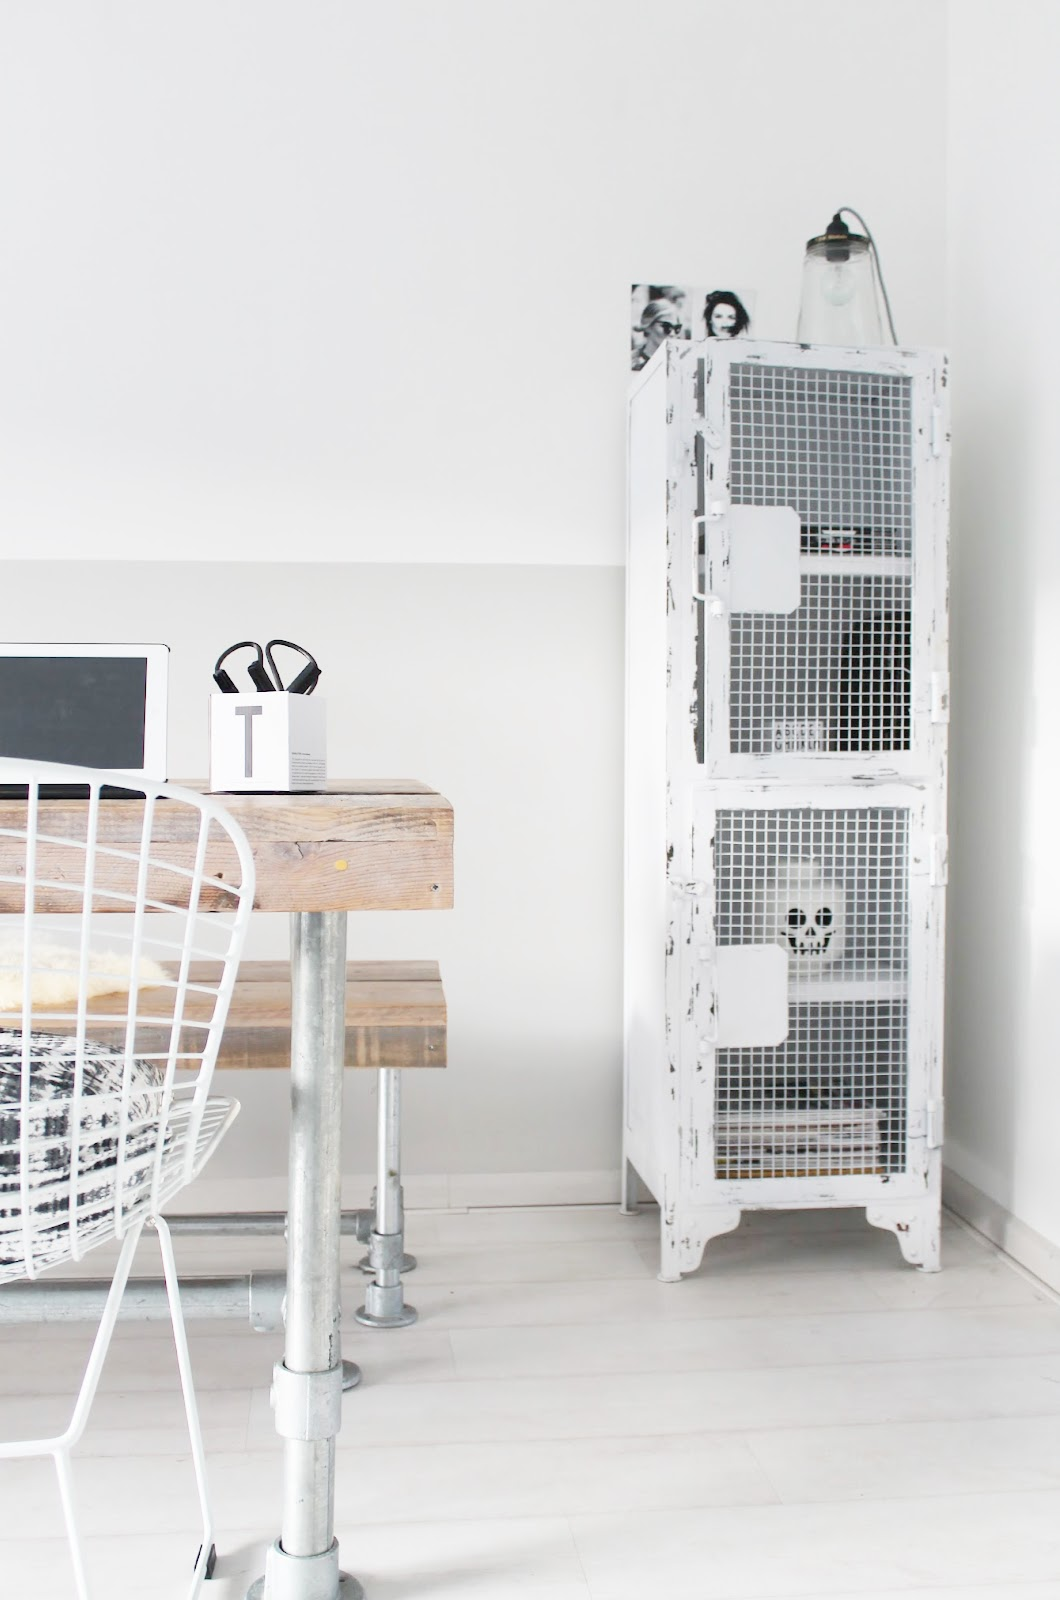 missjettle giga meubel winactie. Black Bedroom Furniture Sets. Home Design Ideas